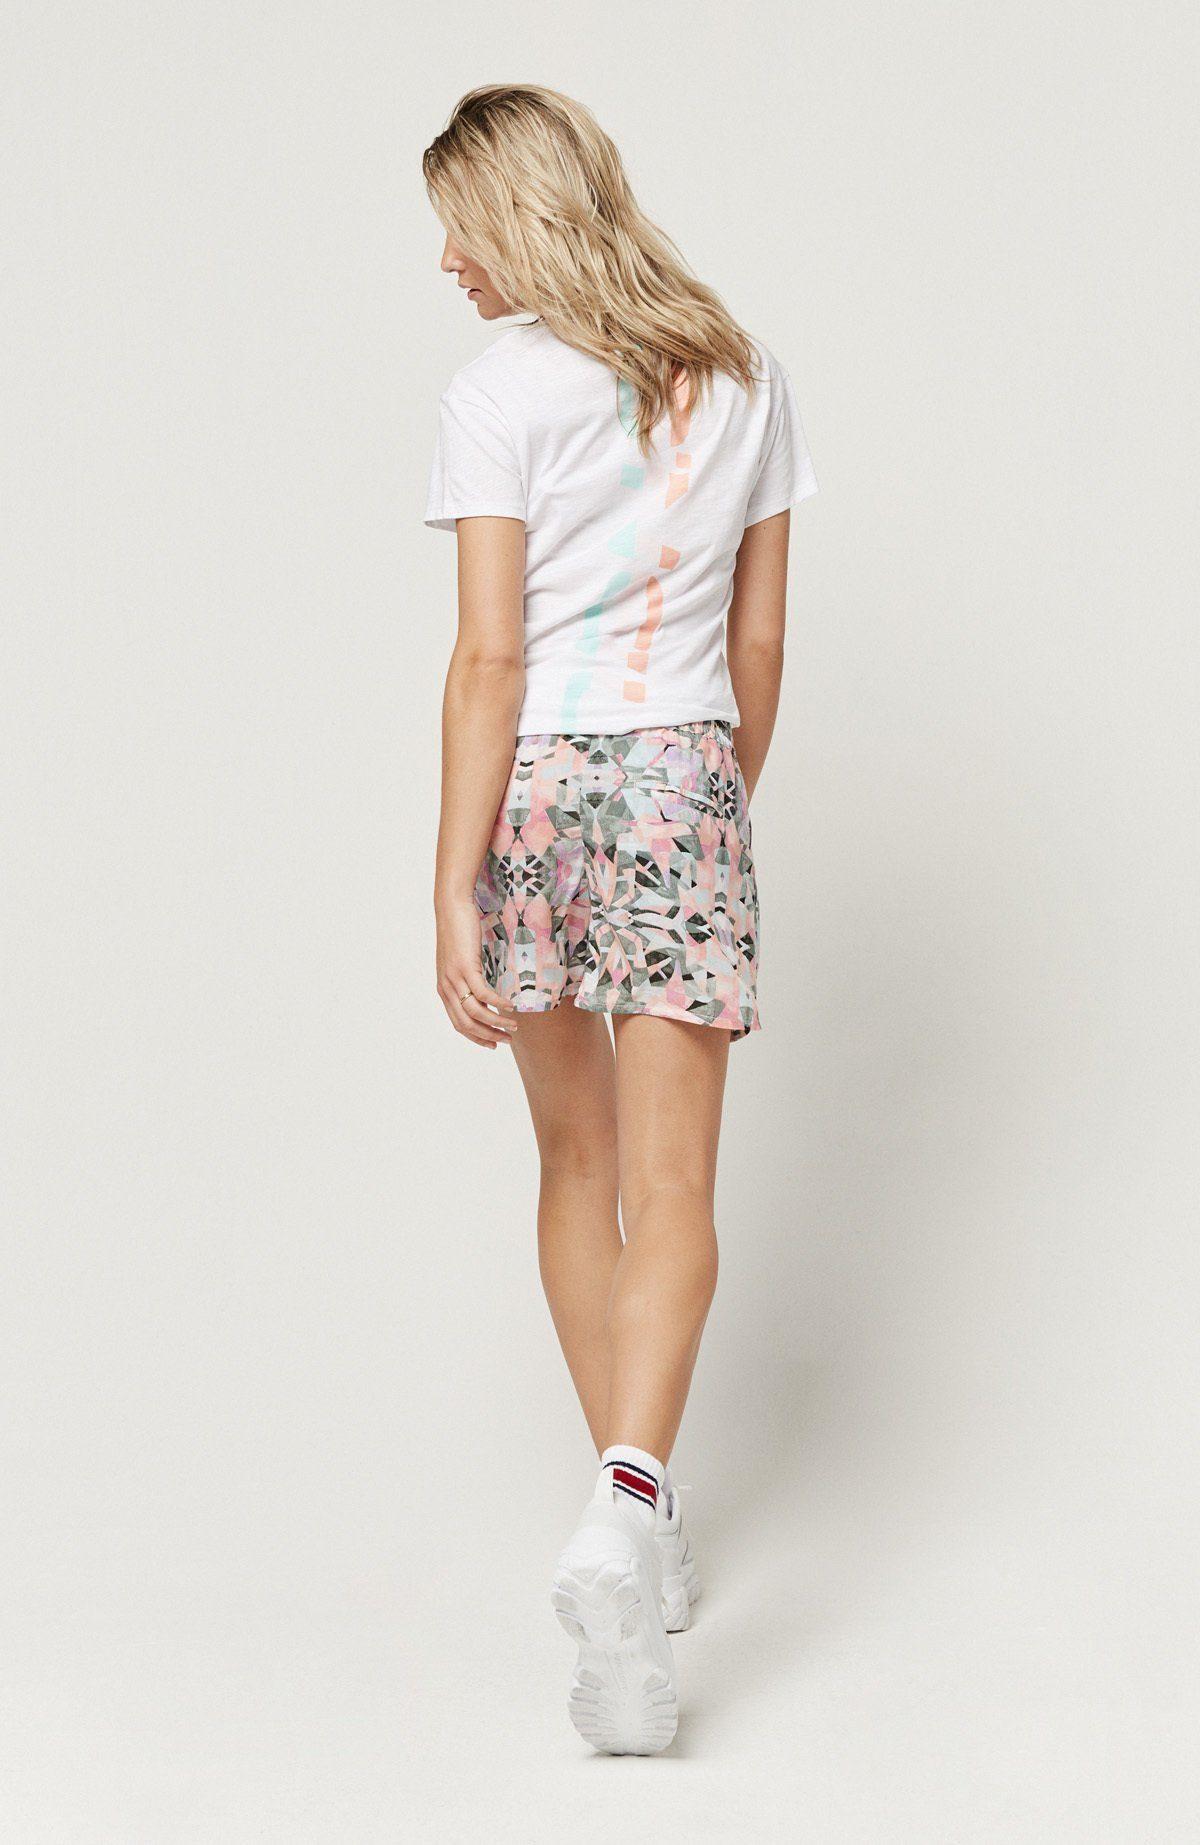 Avenue« T Online shirt O'neill »surf Kaufen nwm08NOv